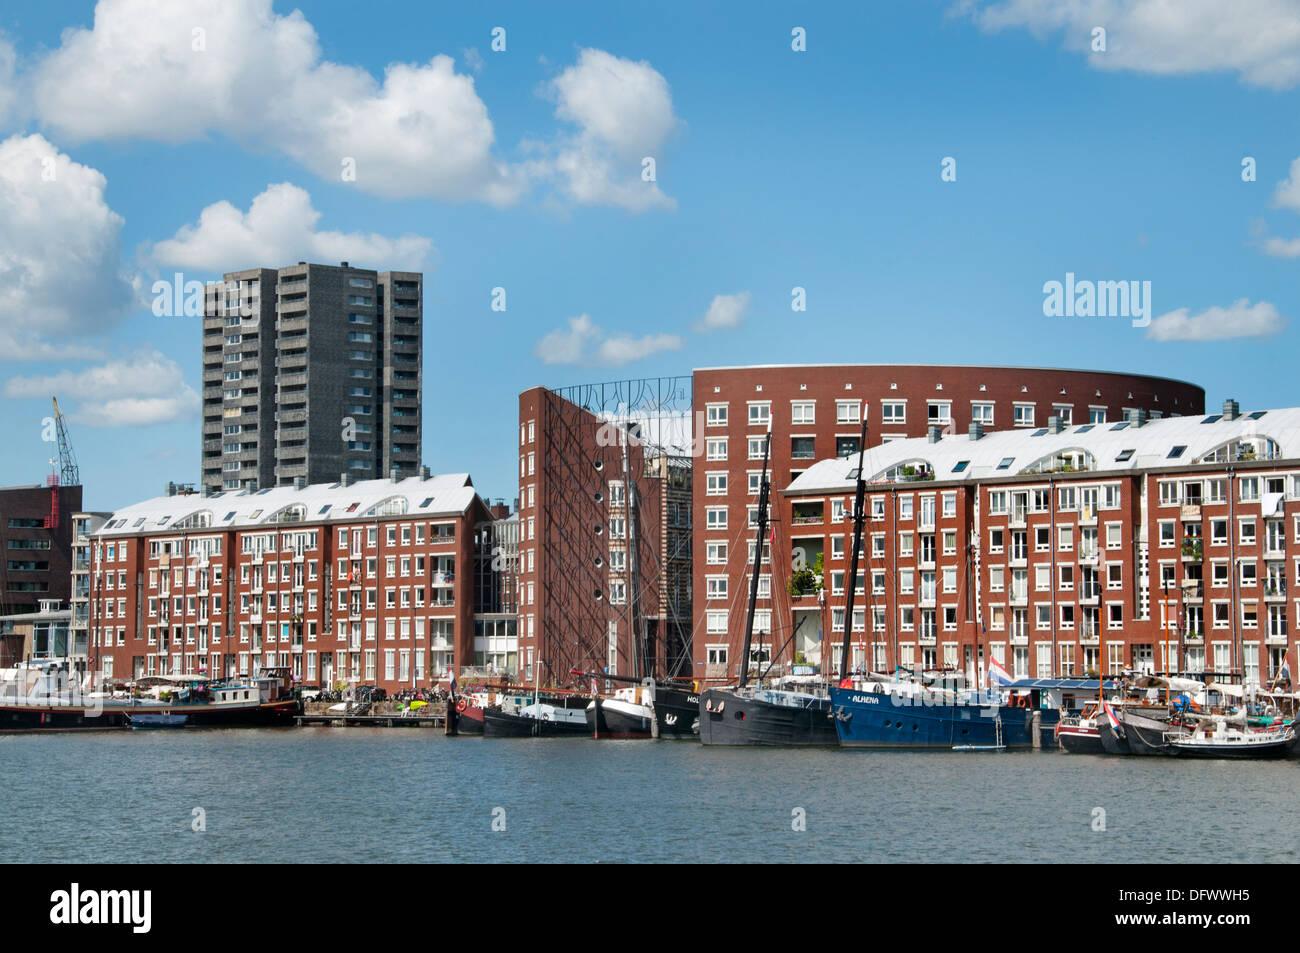 Amsterdam ( Zeeburg -- Java -  KNSM  - Eiland ) Netherlands Dutch modern city town - Stock Image